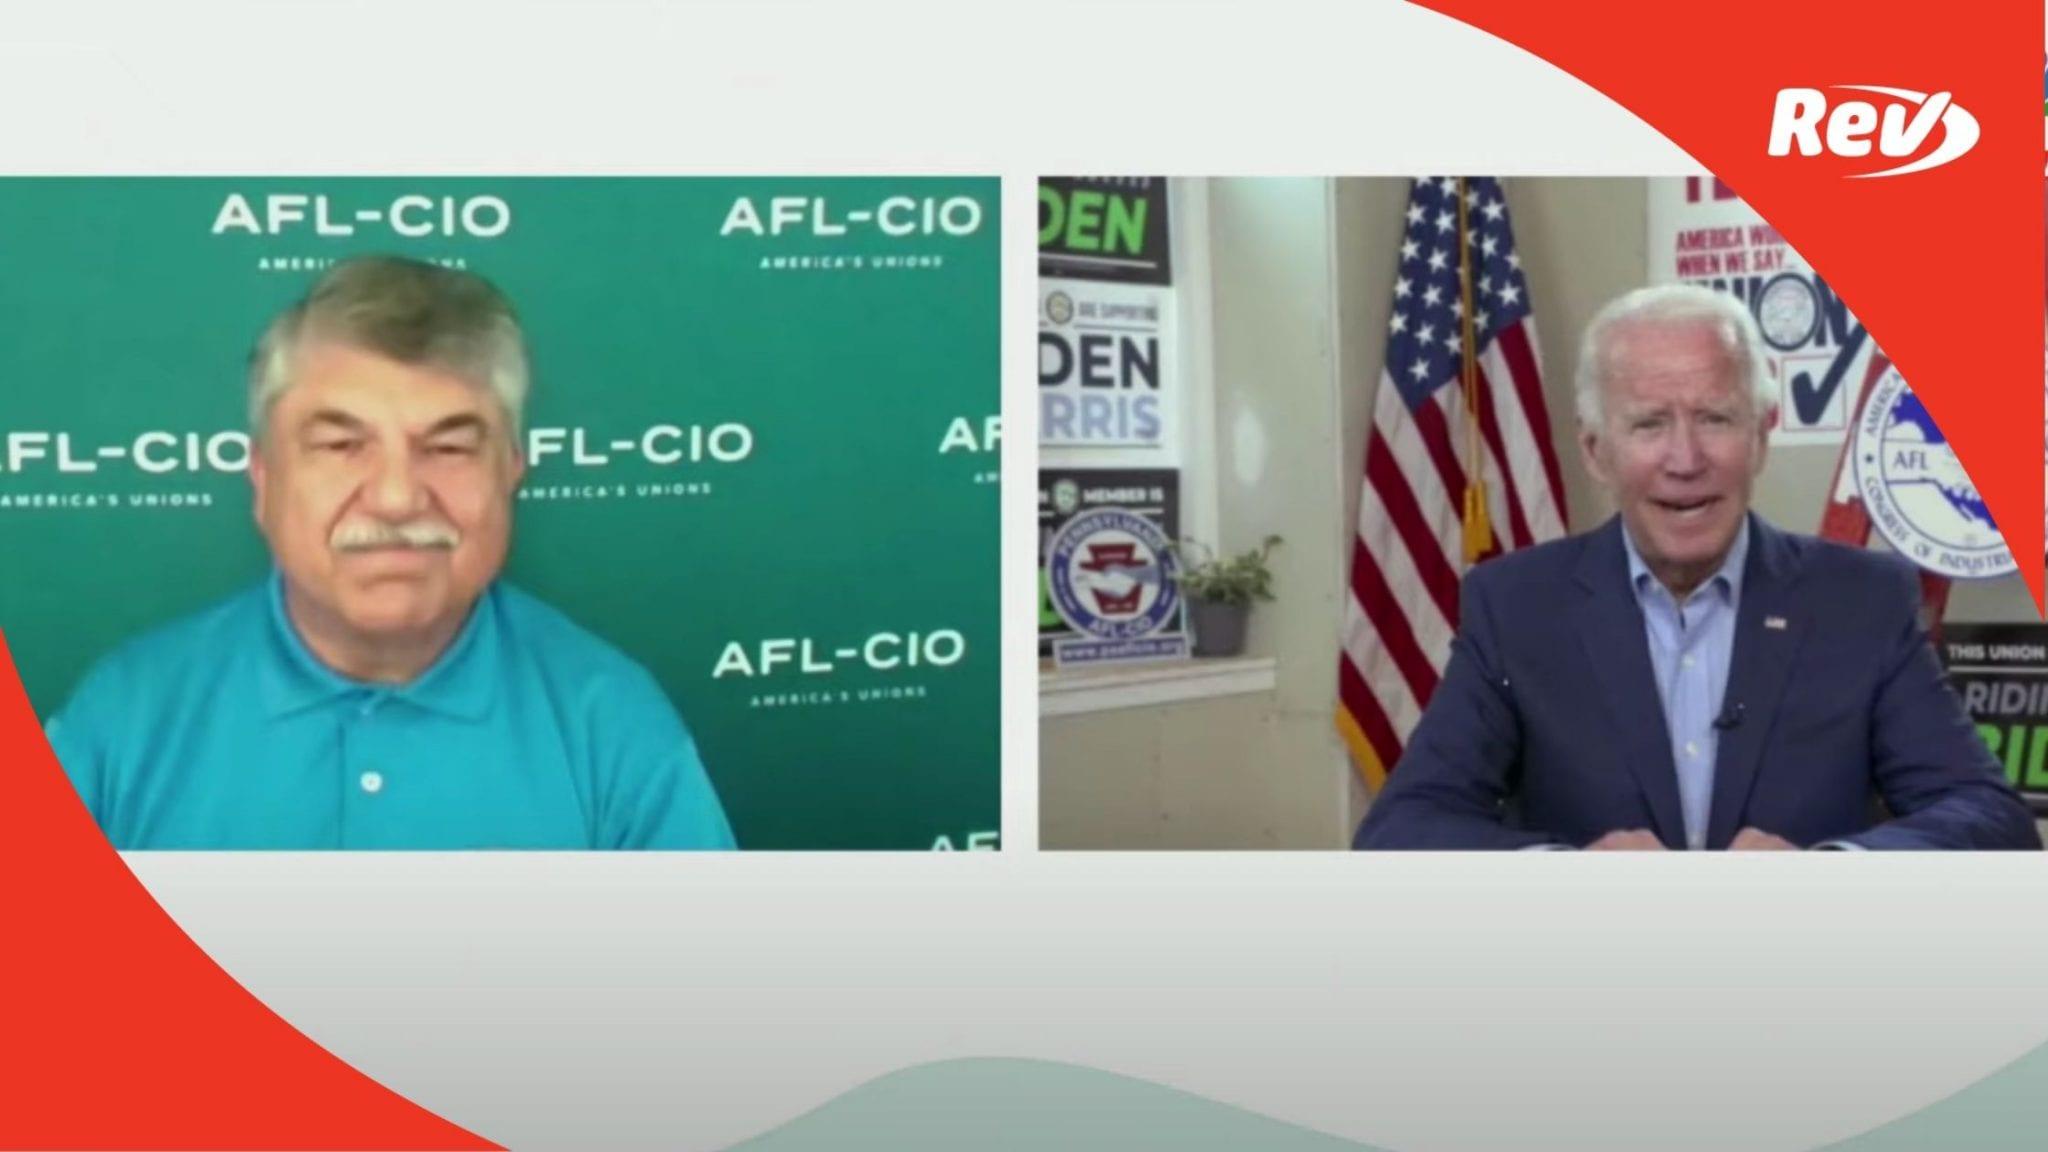 Biden Joins AFL-CIO Virtual Event